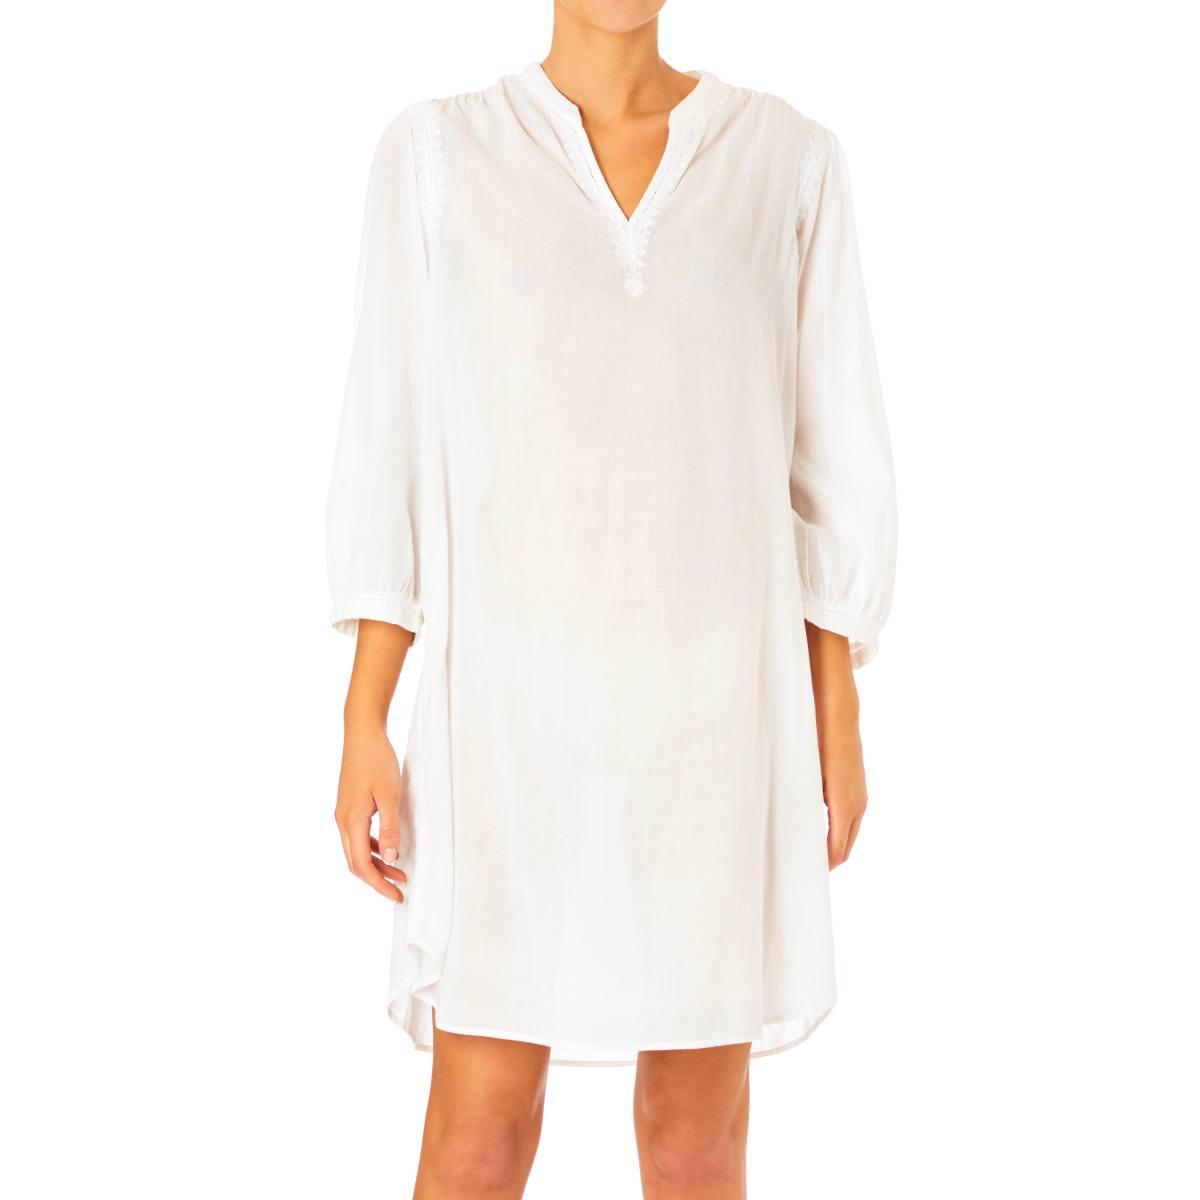 Arya Embroidered Nightshirt White by M.A.B.E | Restoration Yard